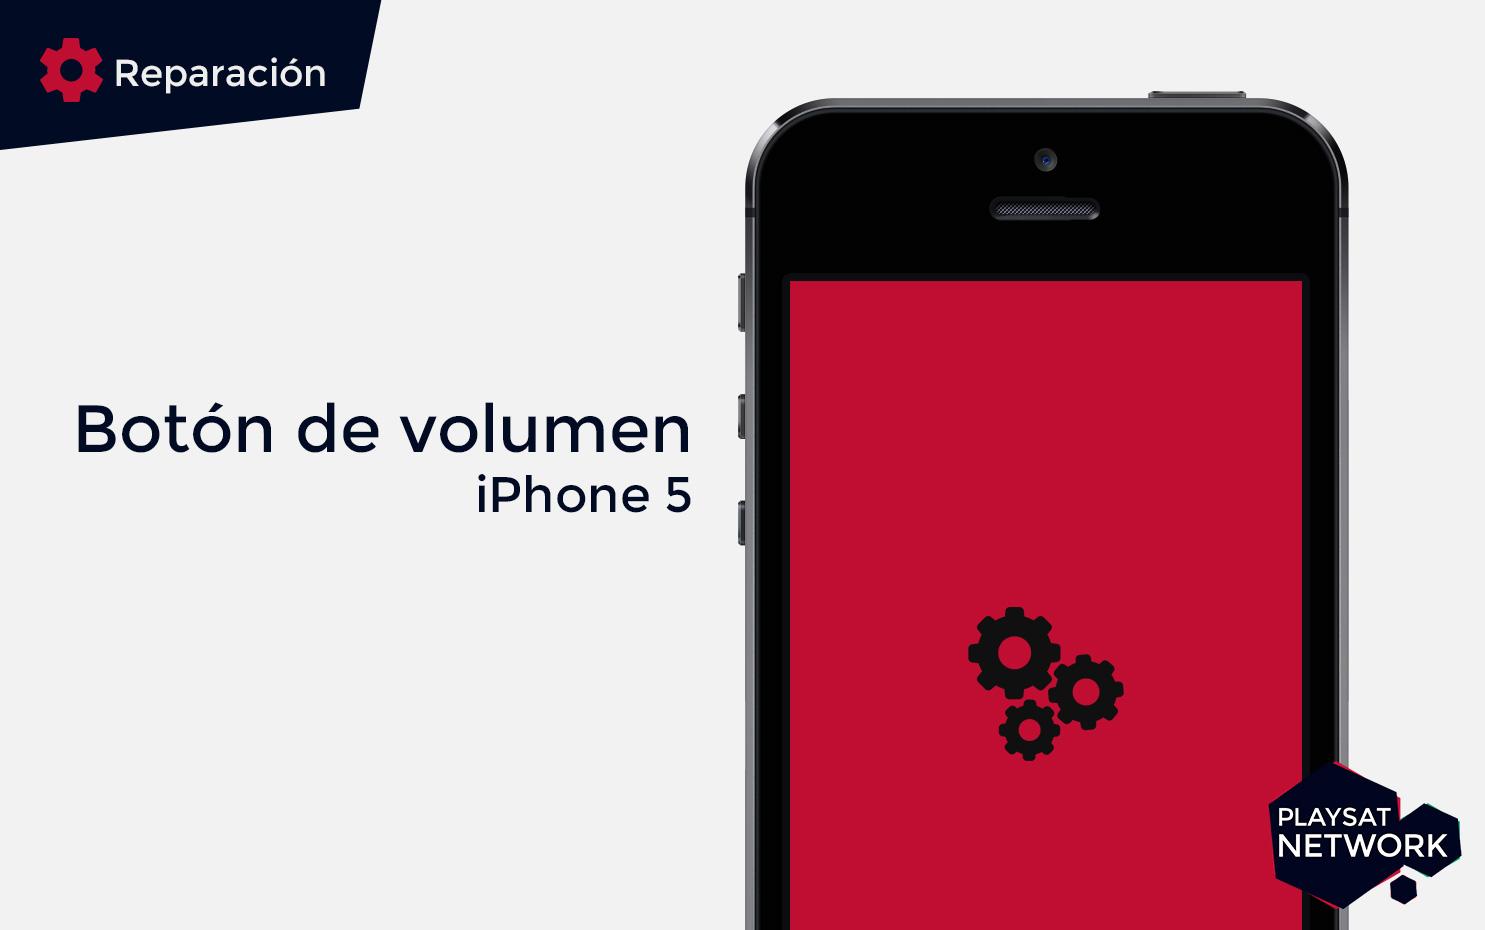 Reparar-botón-de-volumen-iPhone-5